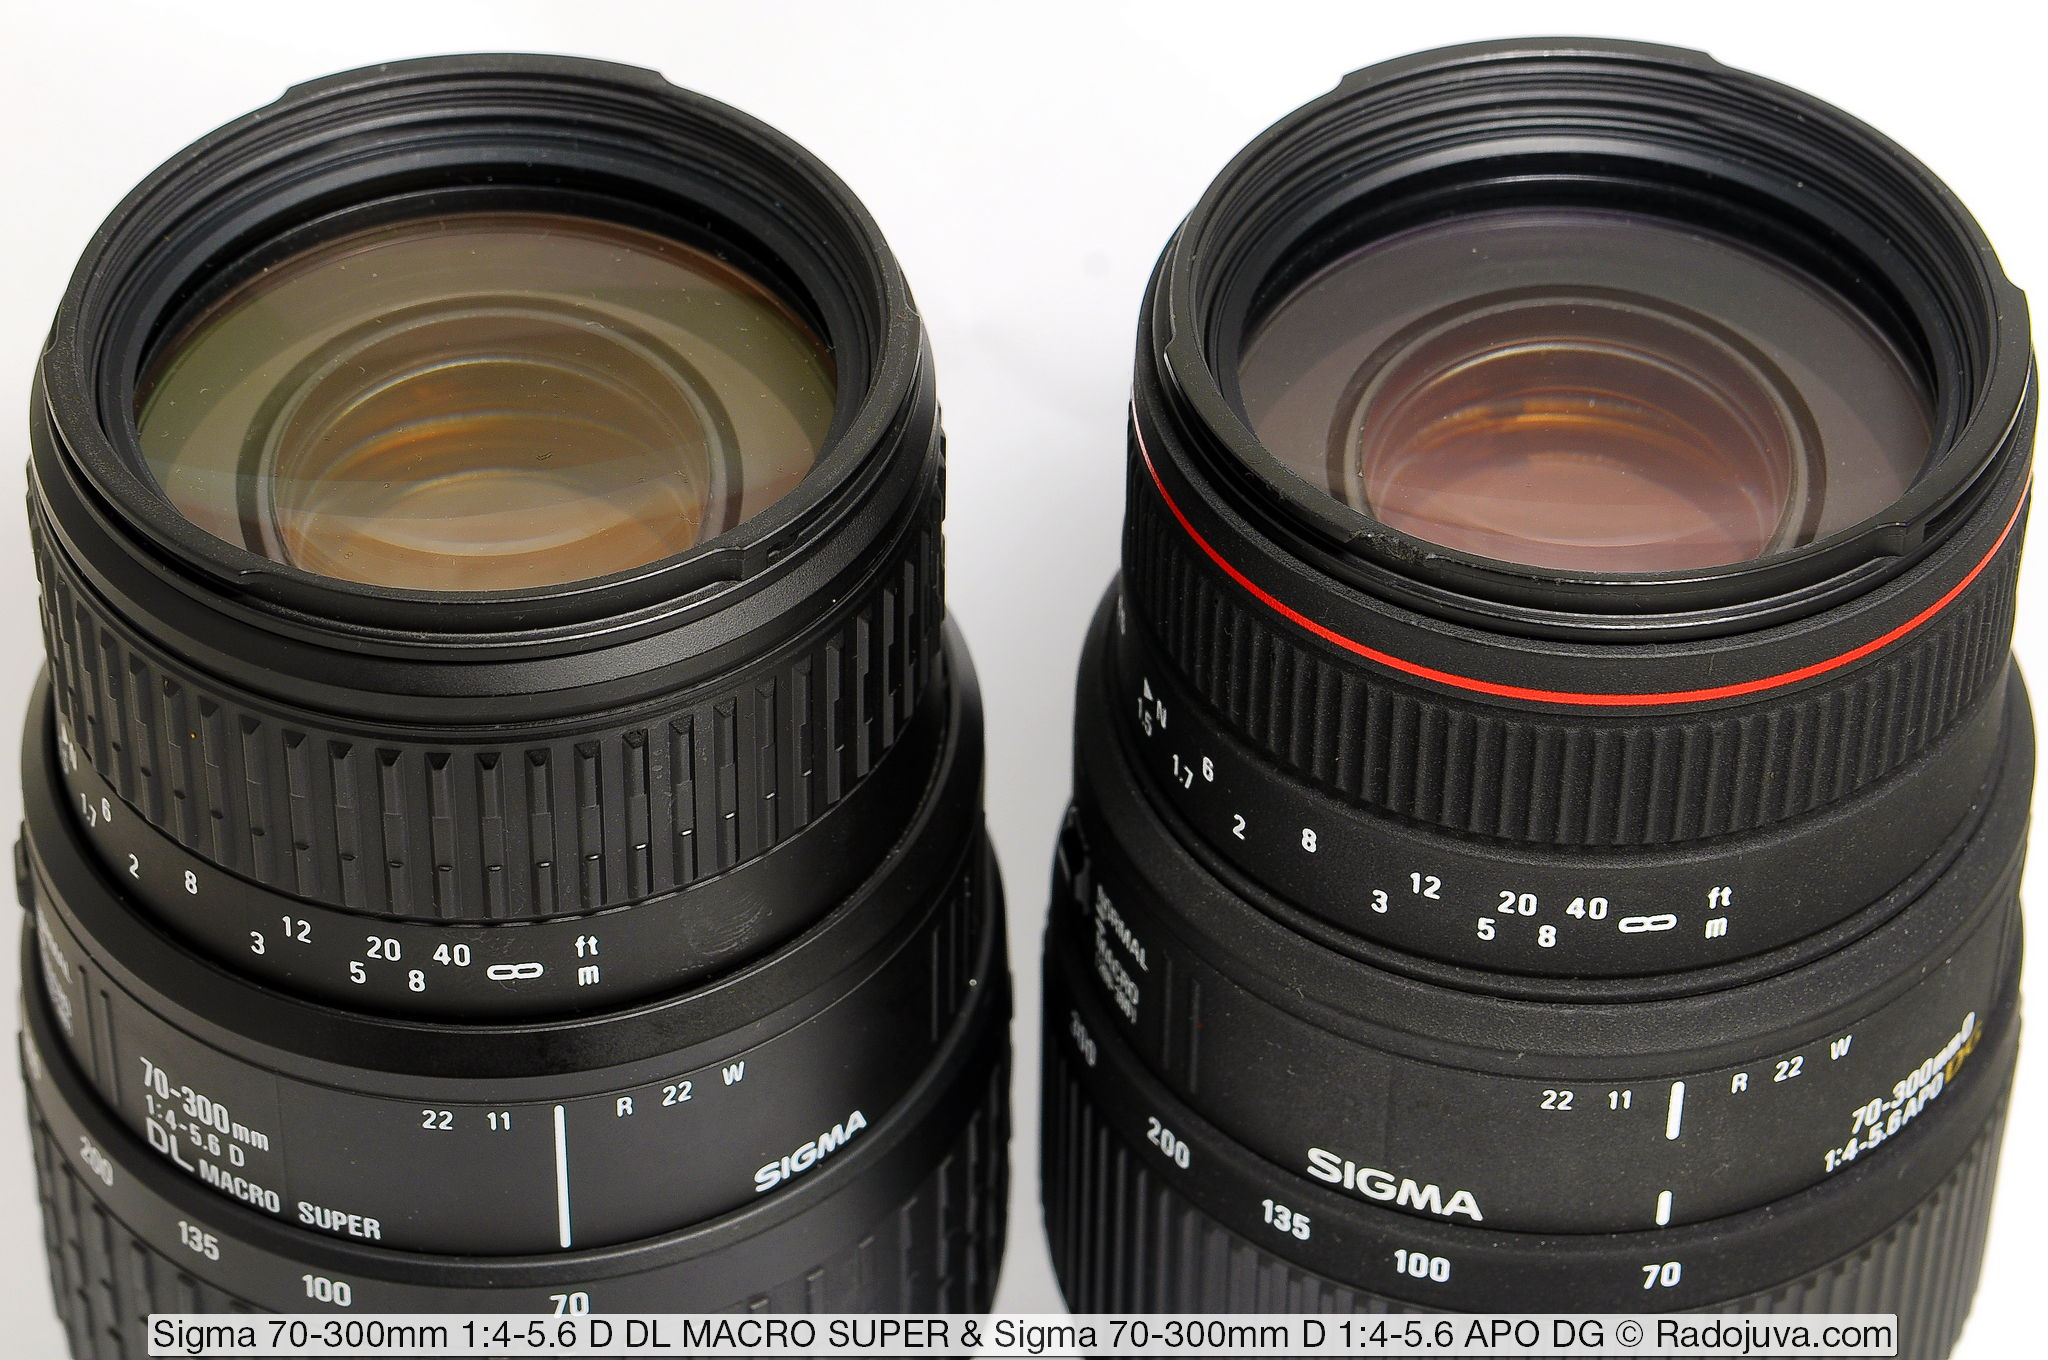 Sigma 70-300mm D 1:4-5.6 APO DG и Sigma 70-300mm 1:4-5.6 D DL MACRO SUPER